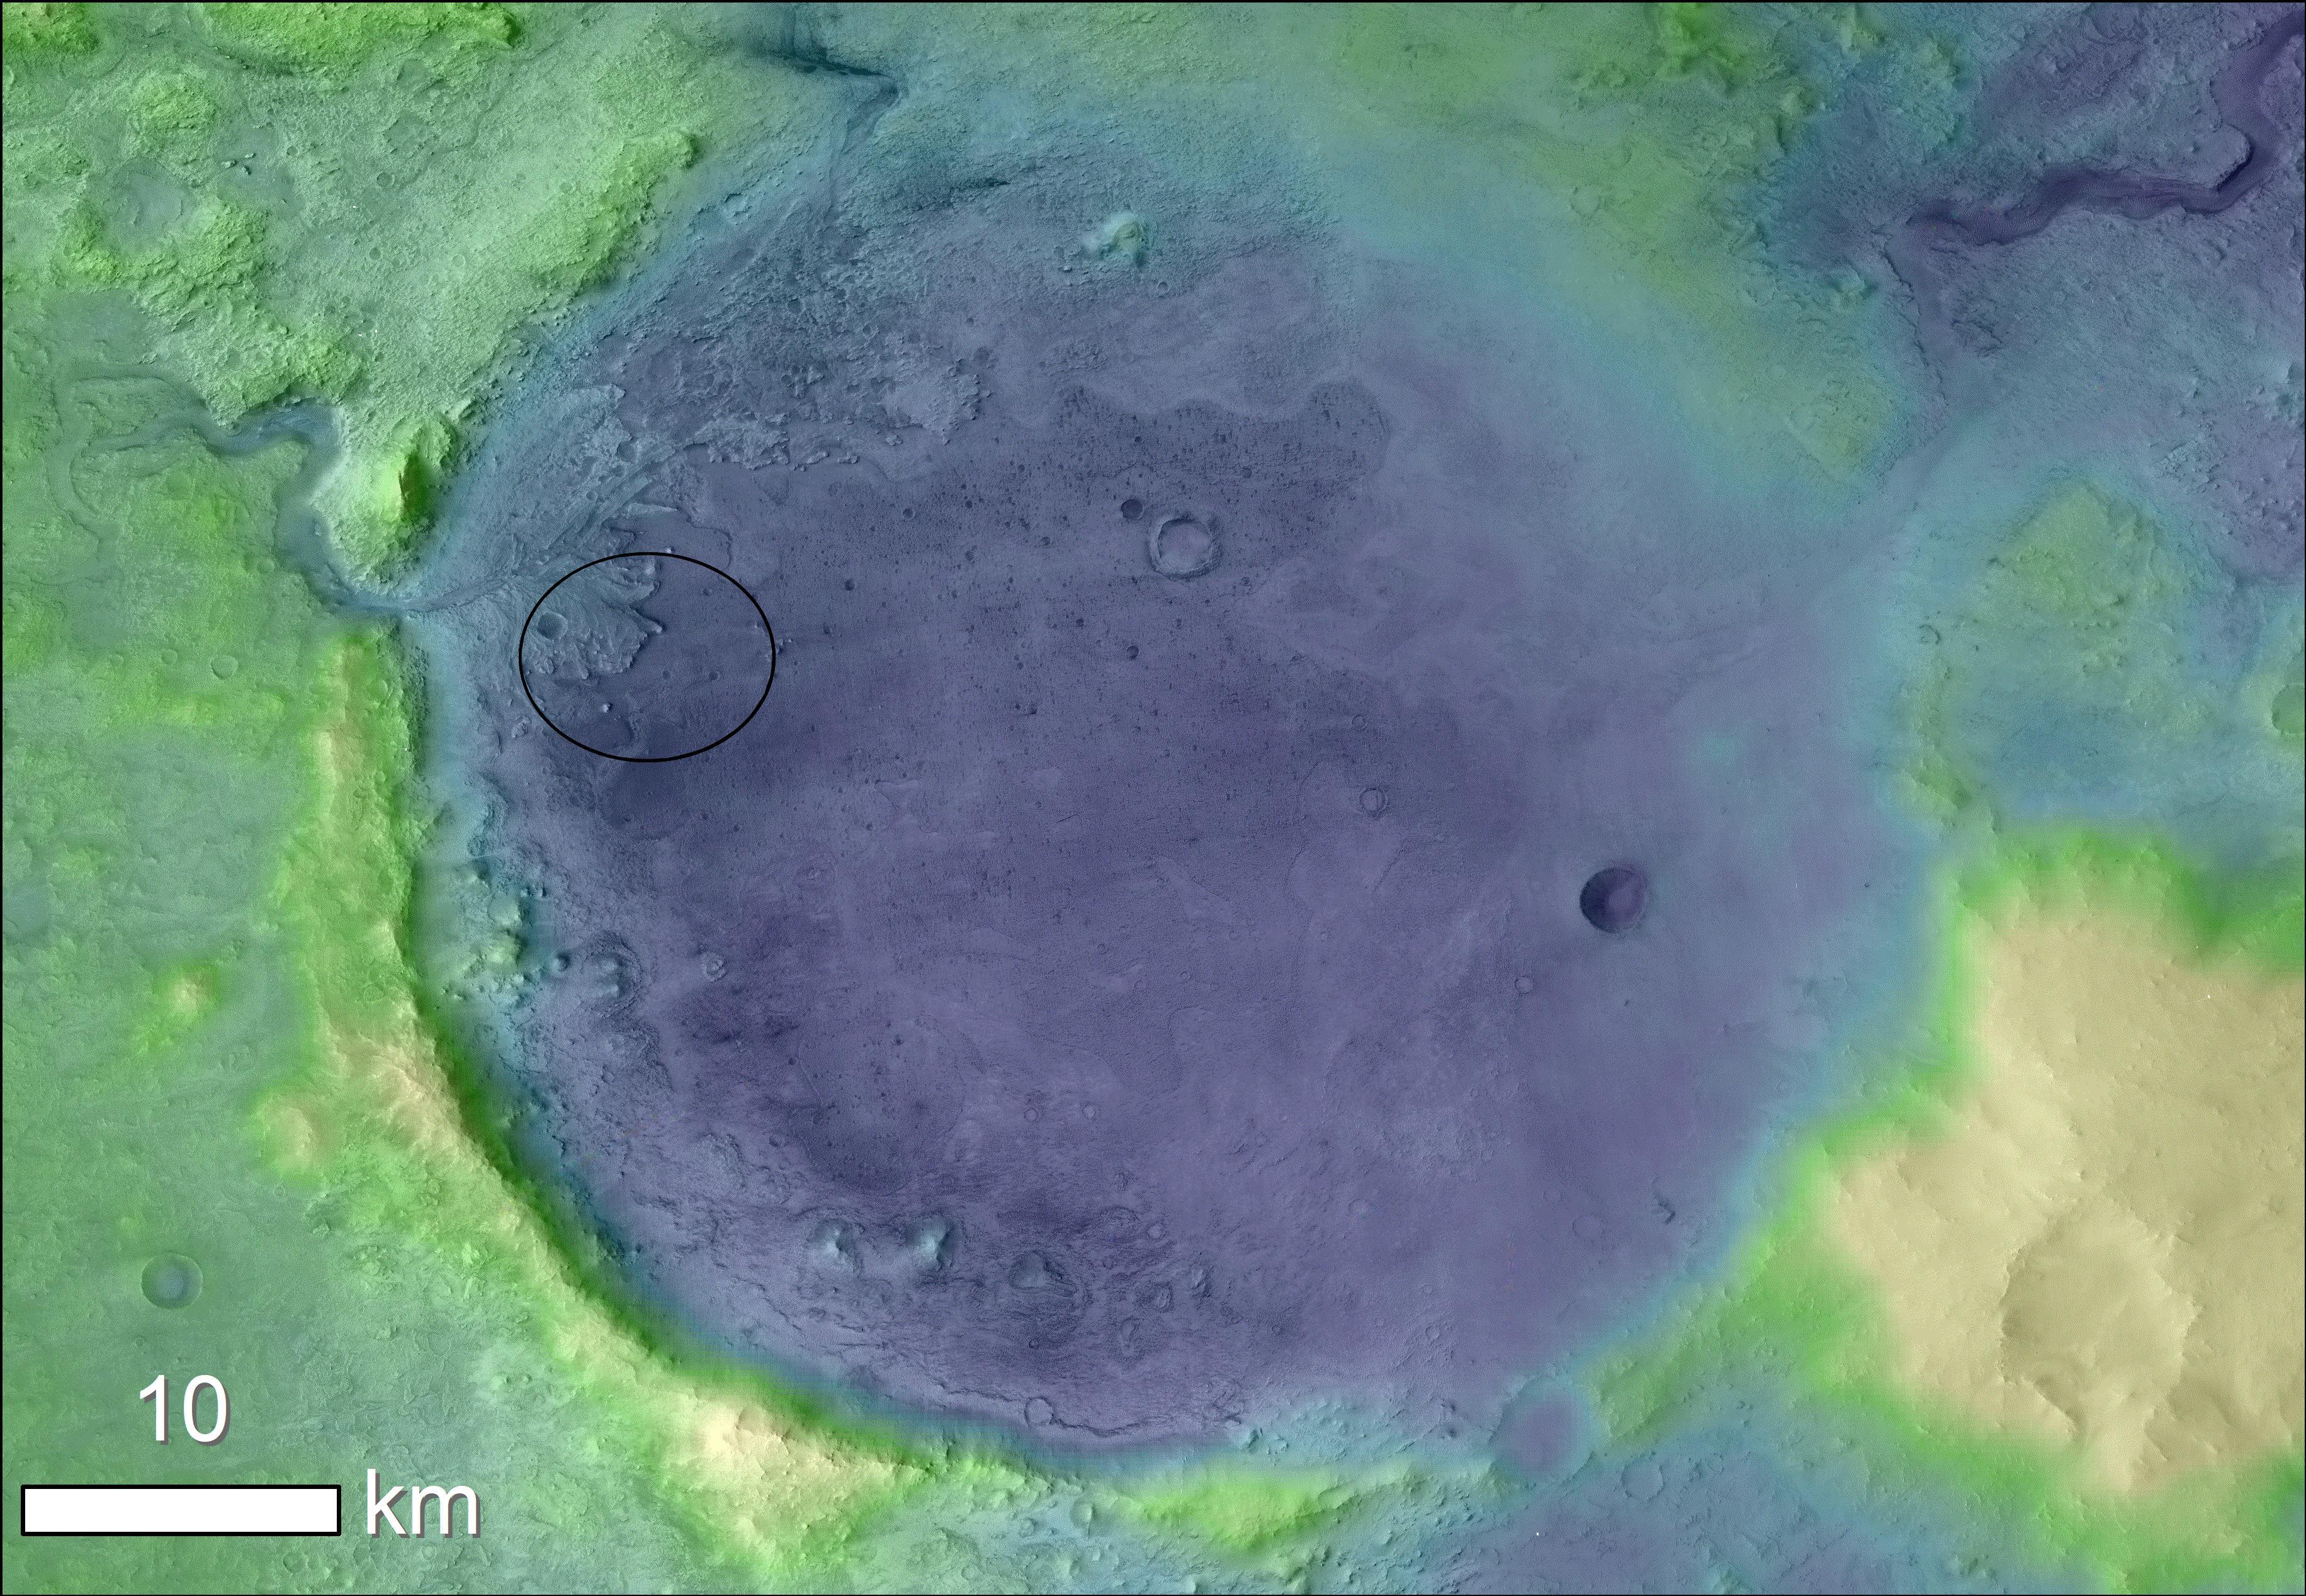 Jezero_crater_elevation_map.jpg